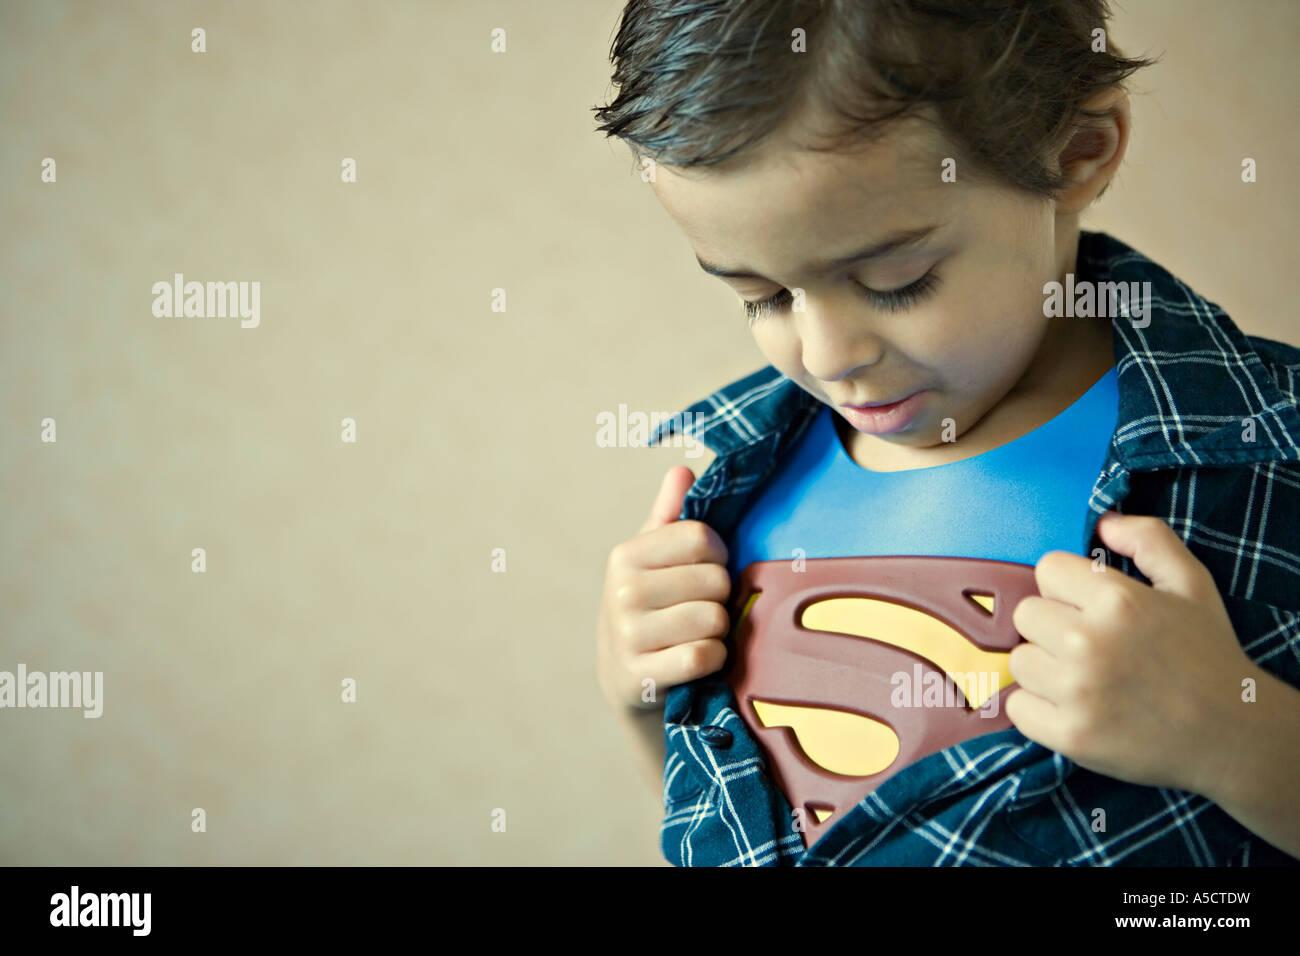 Child reveals Superman costume Stock Photo